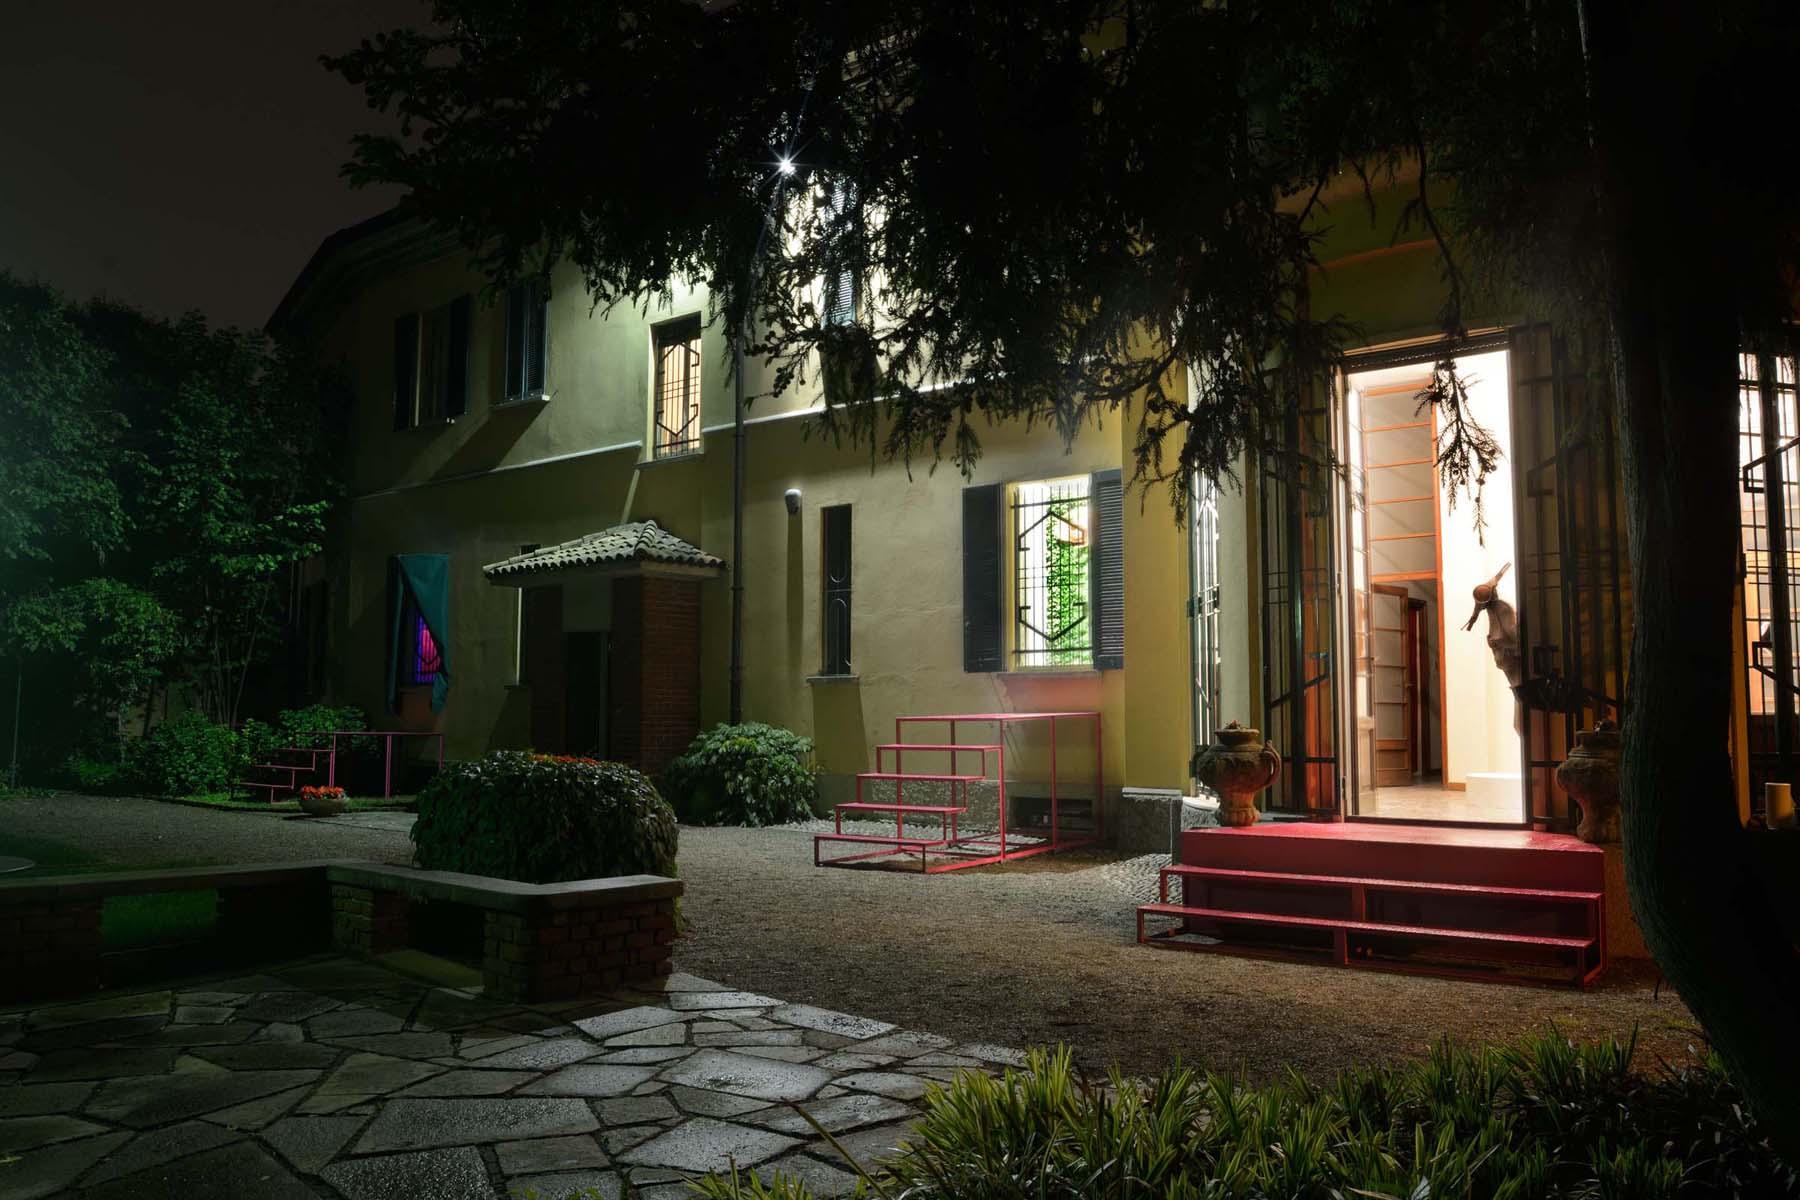 Splendida villa con giardino, exhibition view